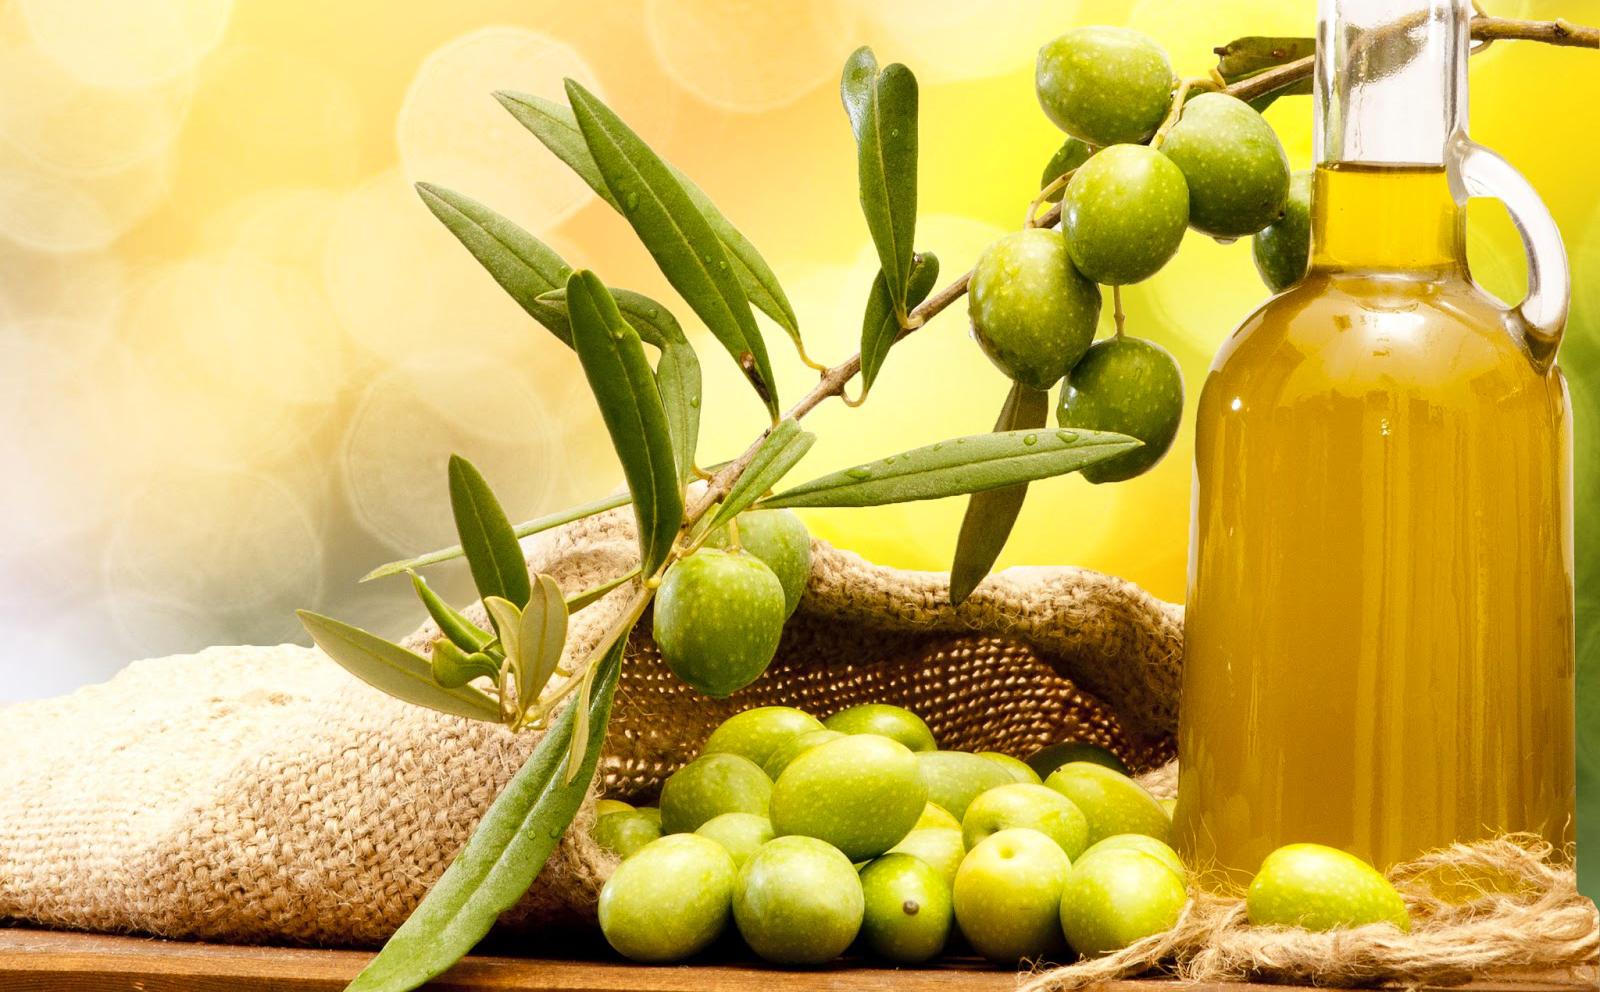 Hasil gambar untuk manfaat minyak zaitun